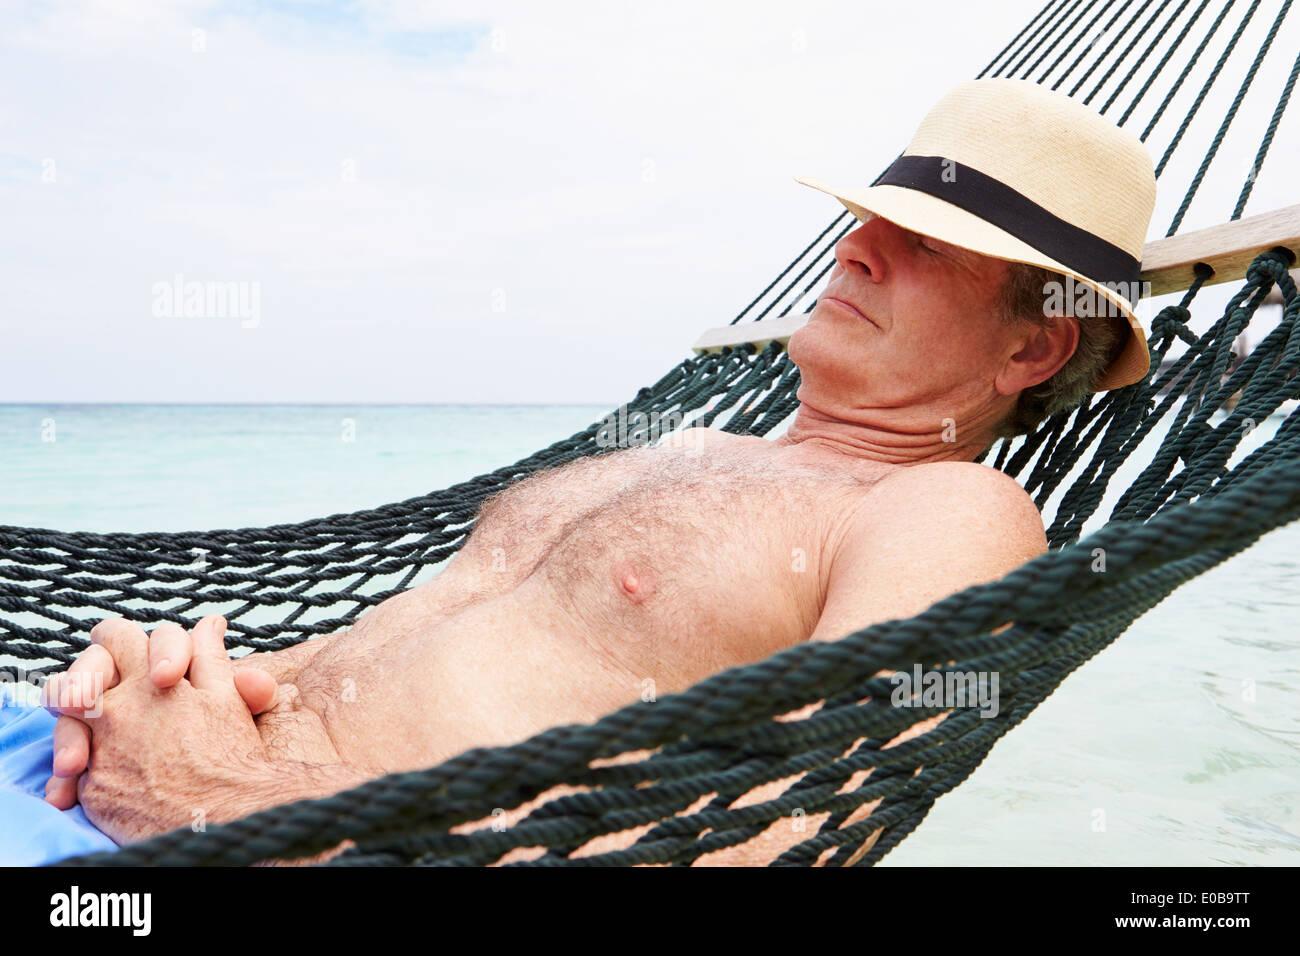 Senior Man Relaxing In Beach Hammock - Stock Image